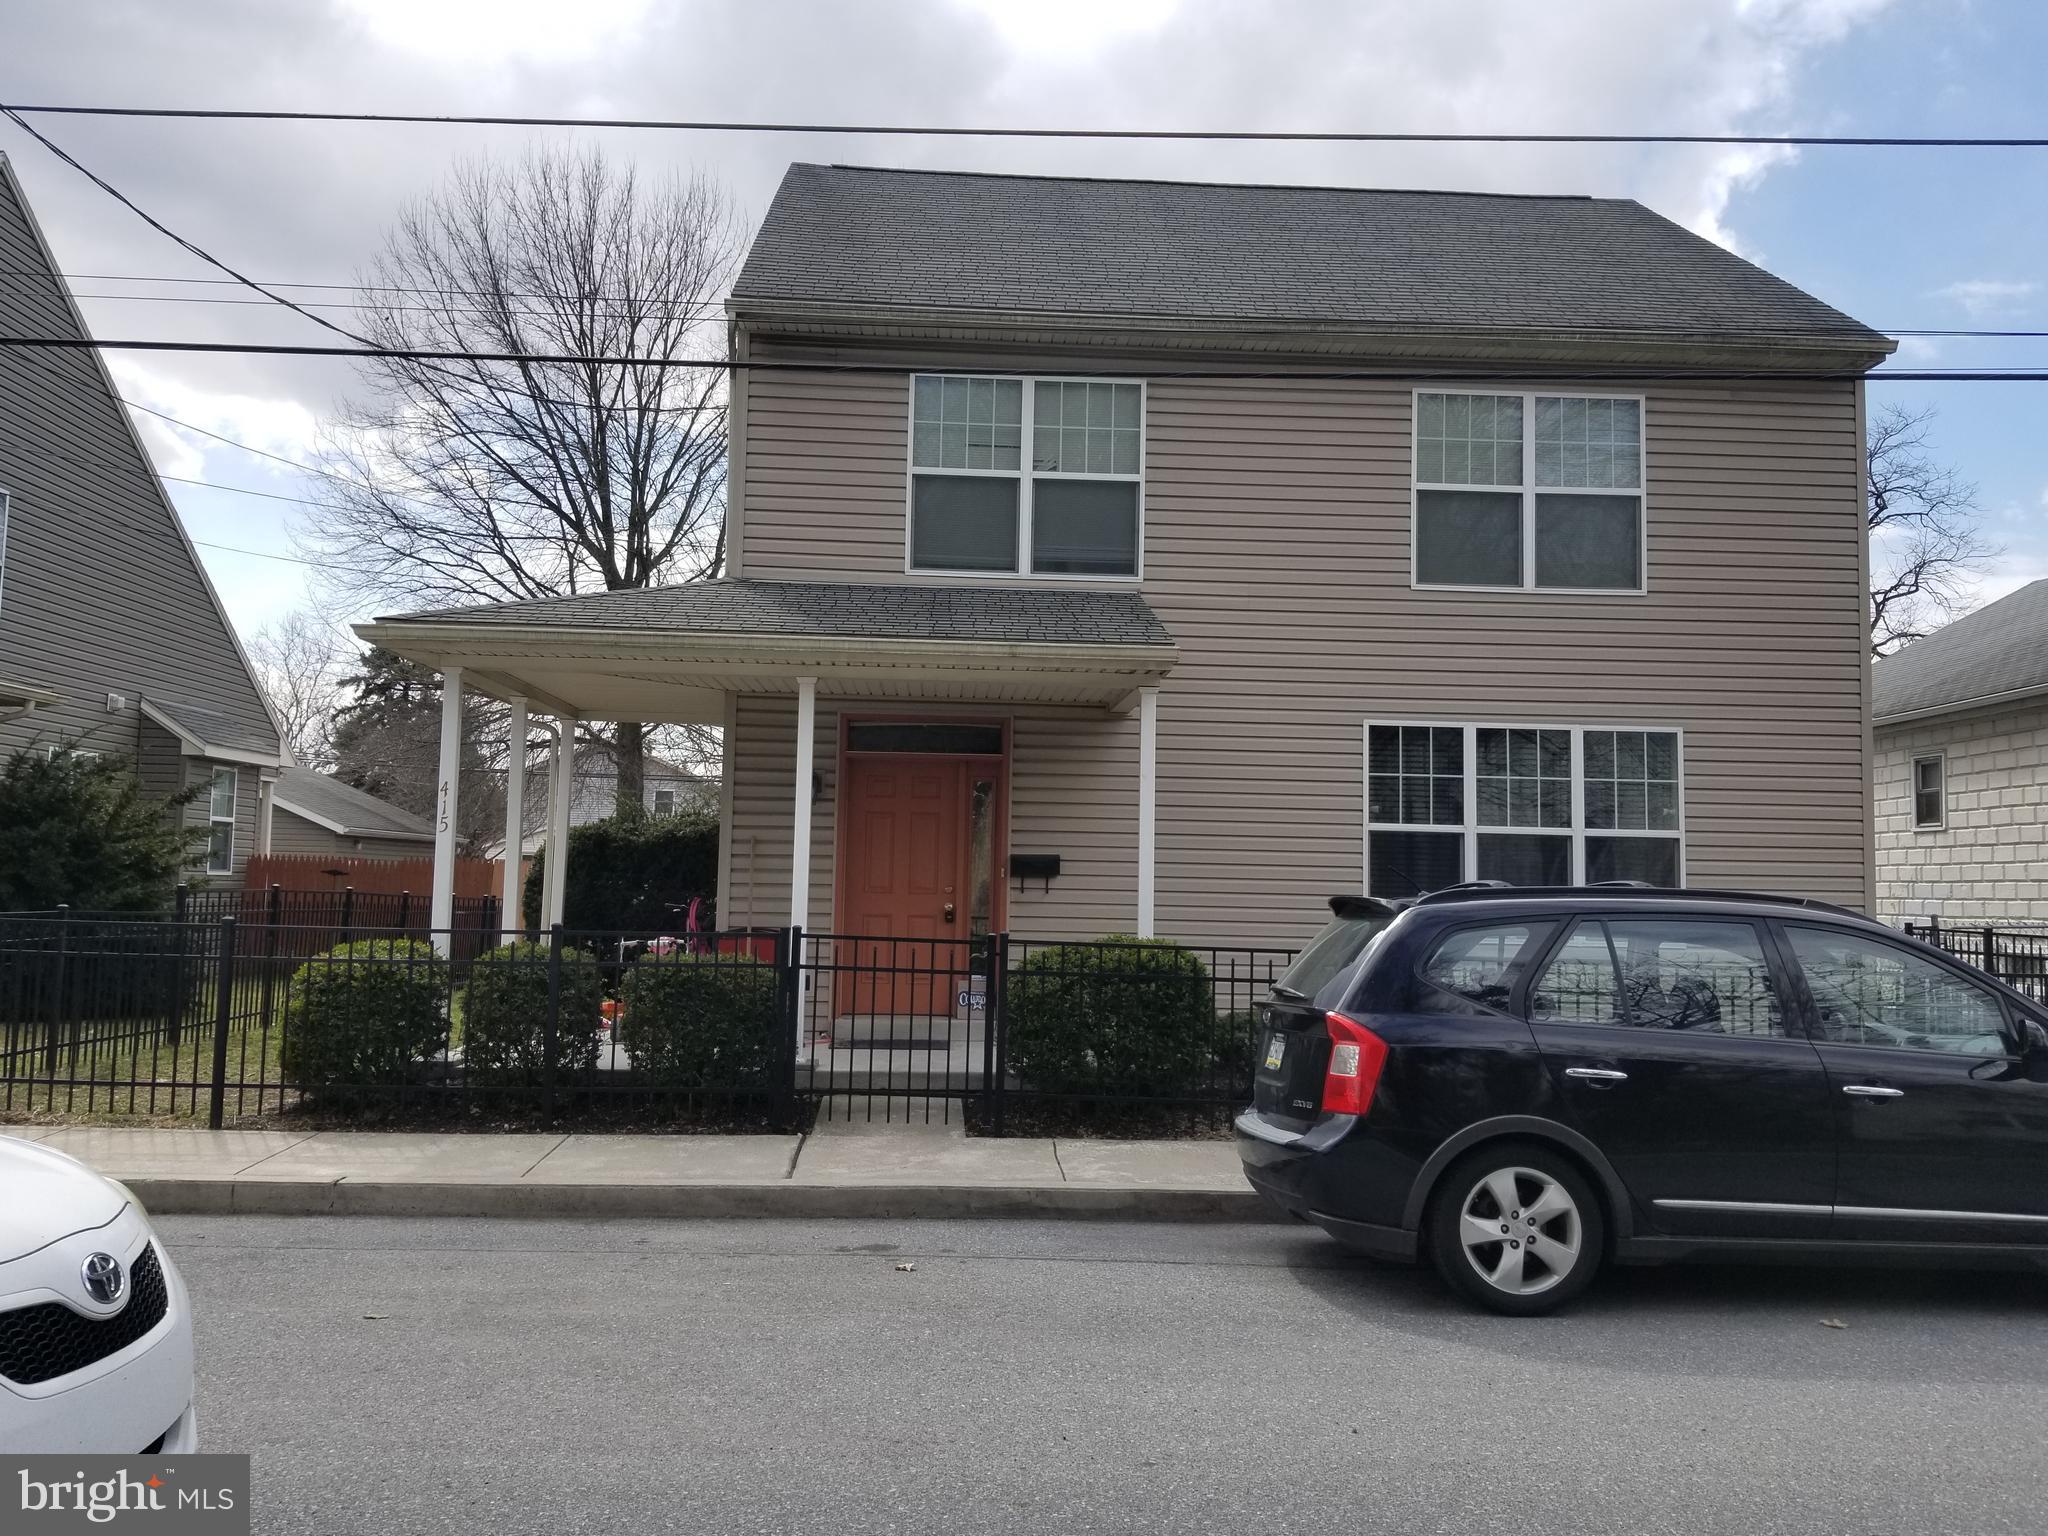 415 MARKET STREET, HIGHSPIRE, PA 17034